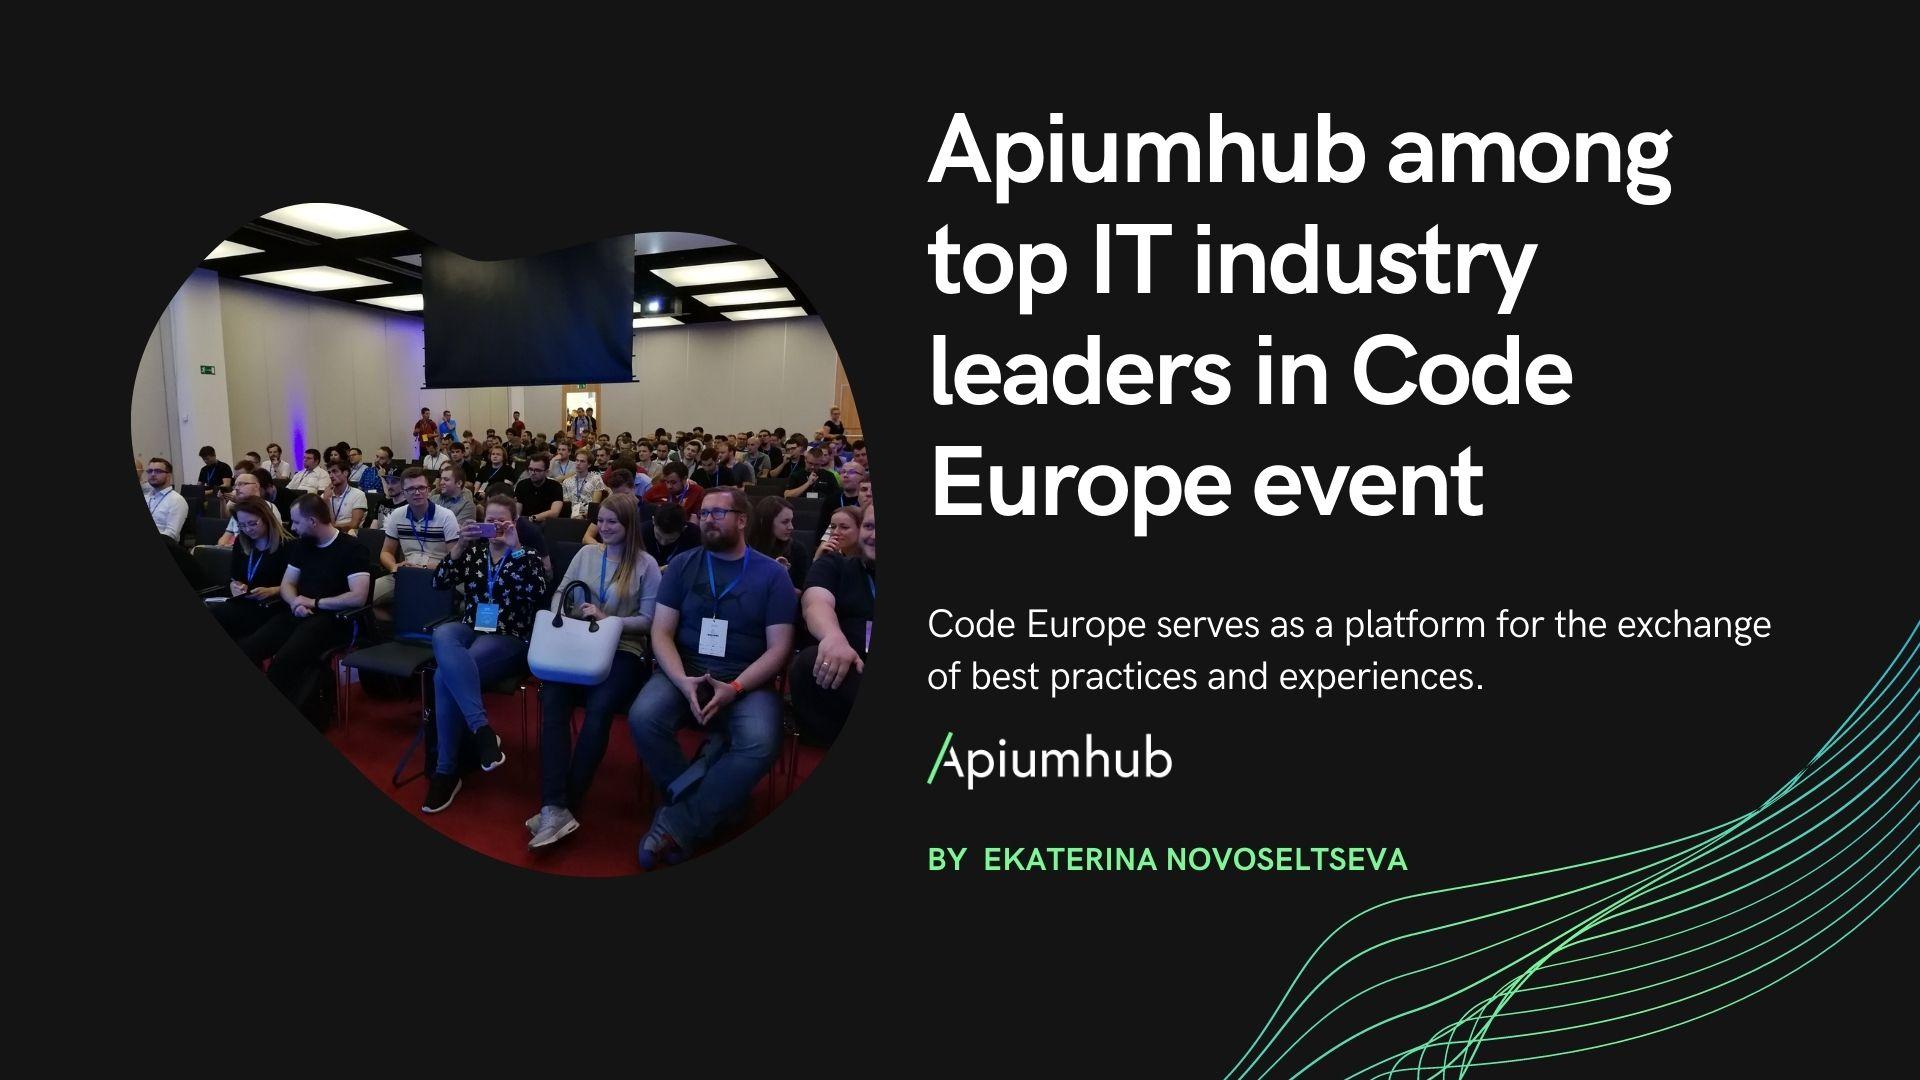 Apiumhub among top IT industry leaders in Code Europe event